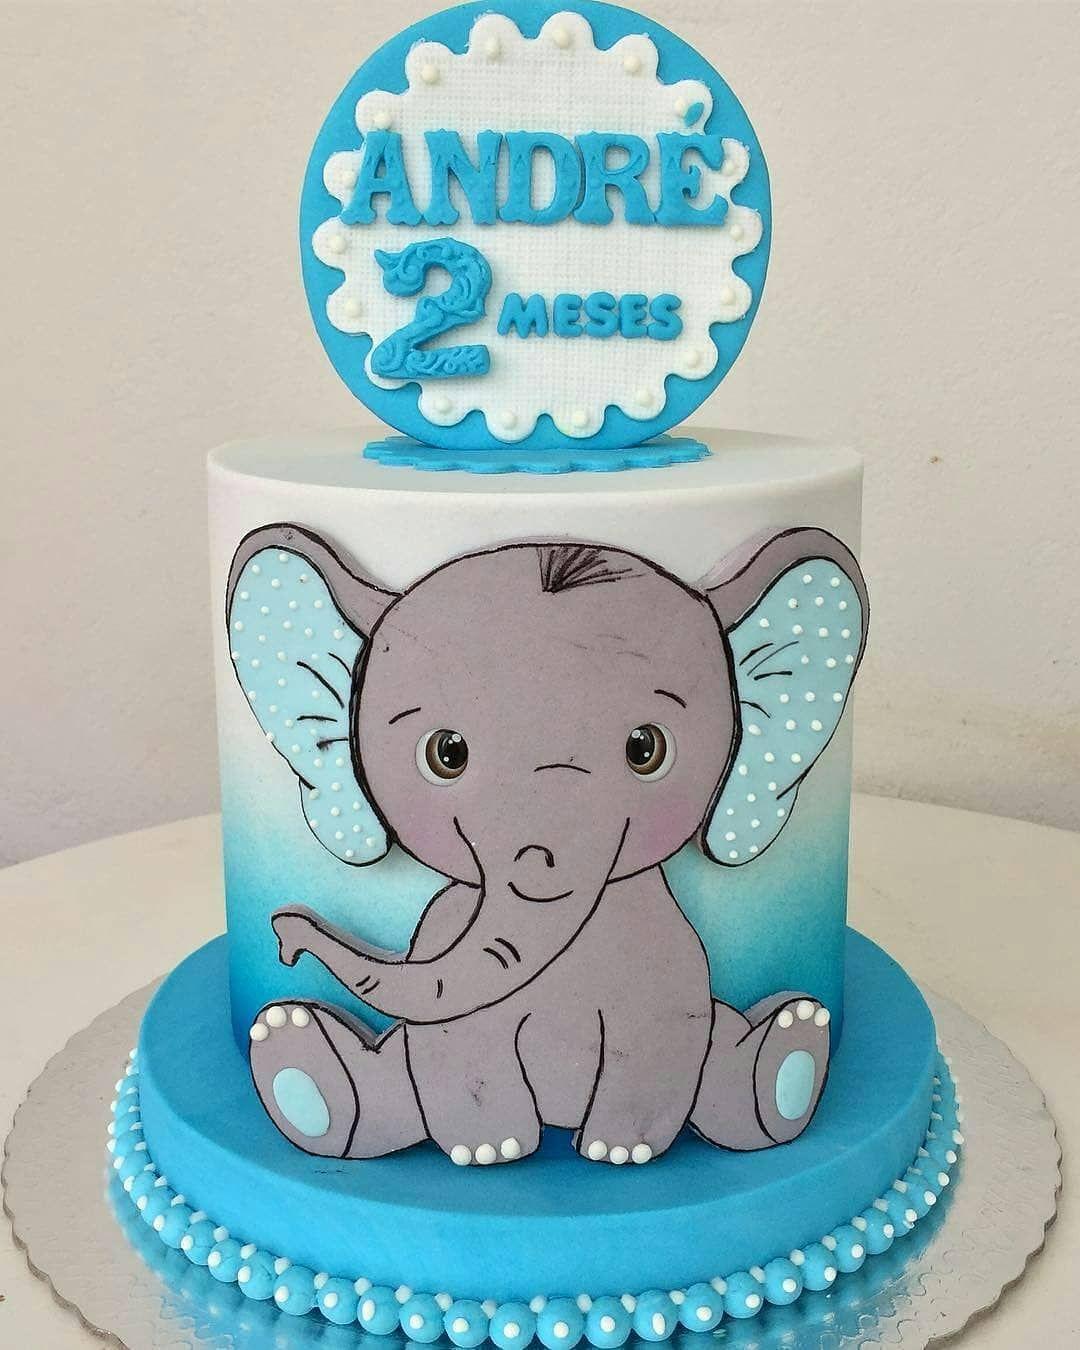 Cakebakeoffng Blog On Instagram Cute Monica Moriel Cakebakeoffng Cakebakeoff Cbocakes Instal Baby Cake Design Baby Cake Baby Shower Cakes